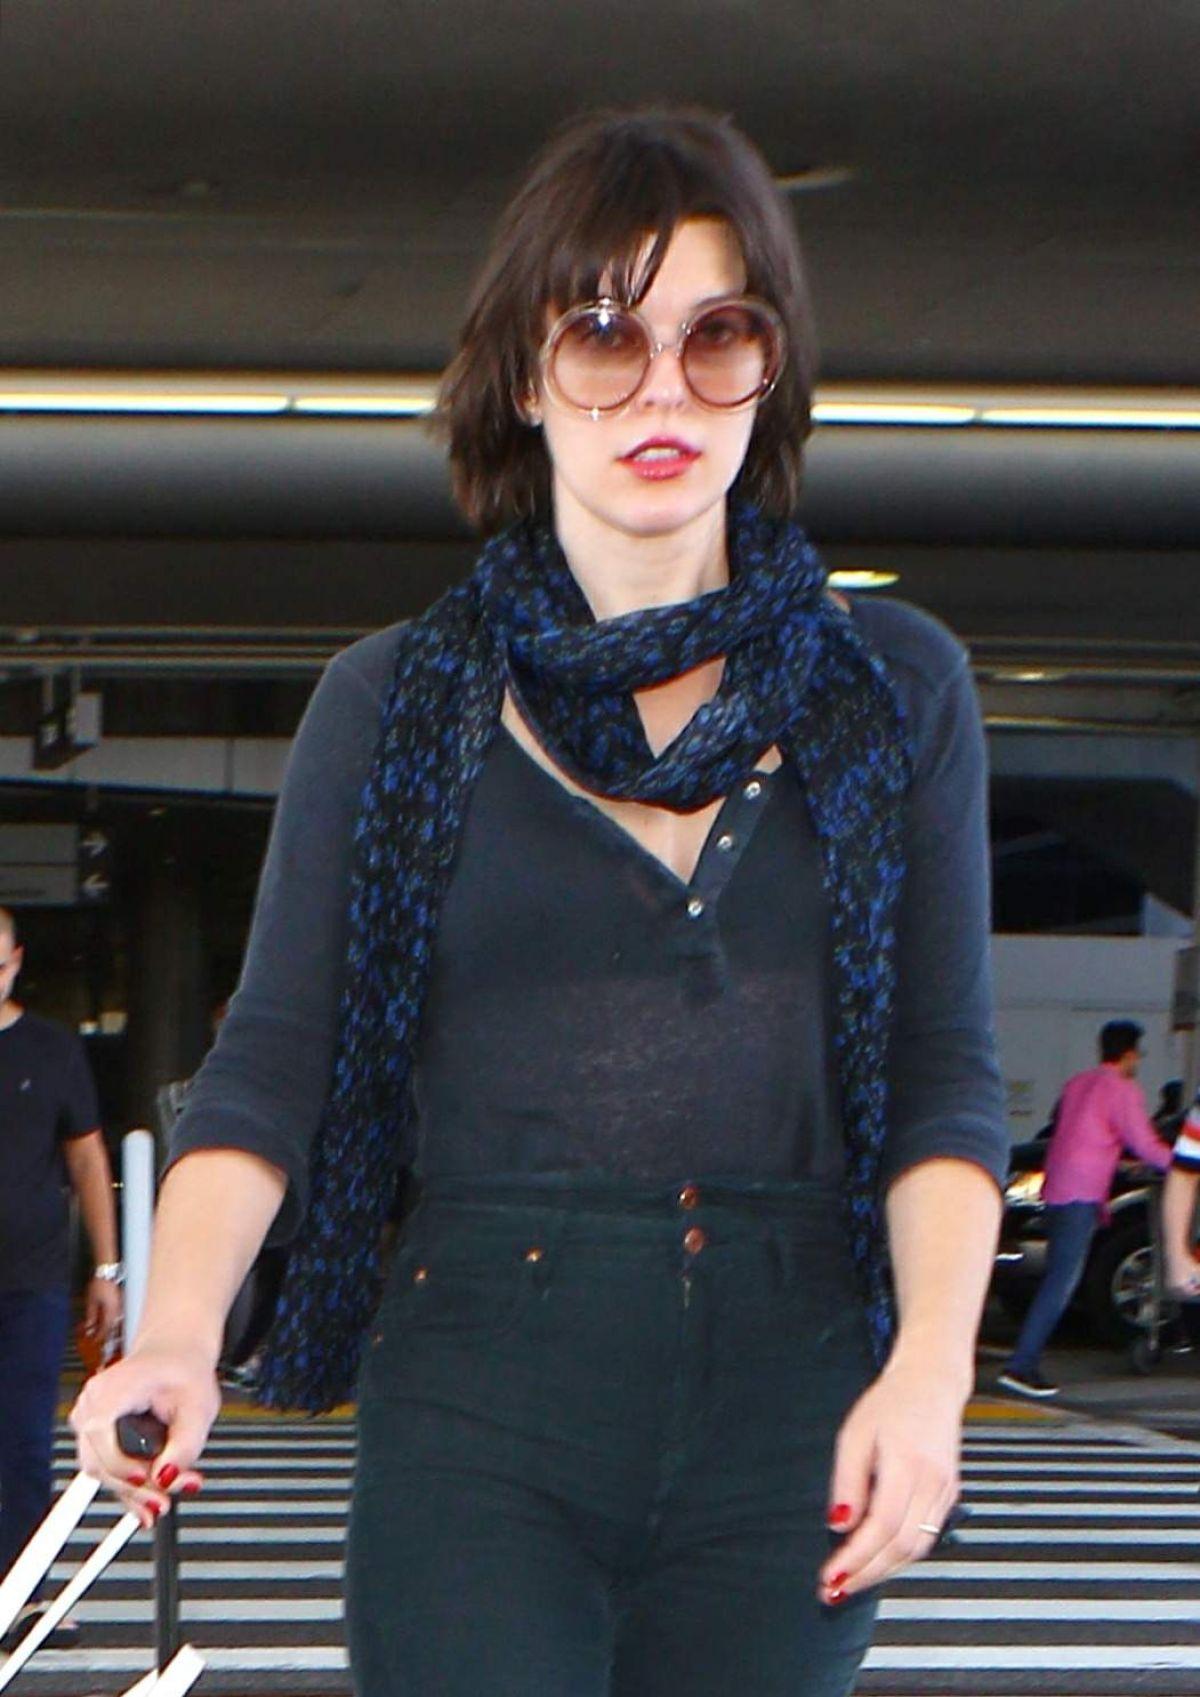 MILLA JOVOVICH at Los Angeles international Airport 10/02 ... Milla Jovovich